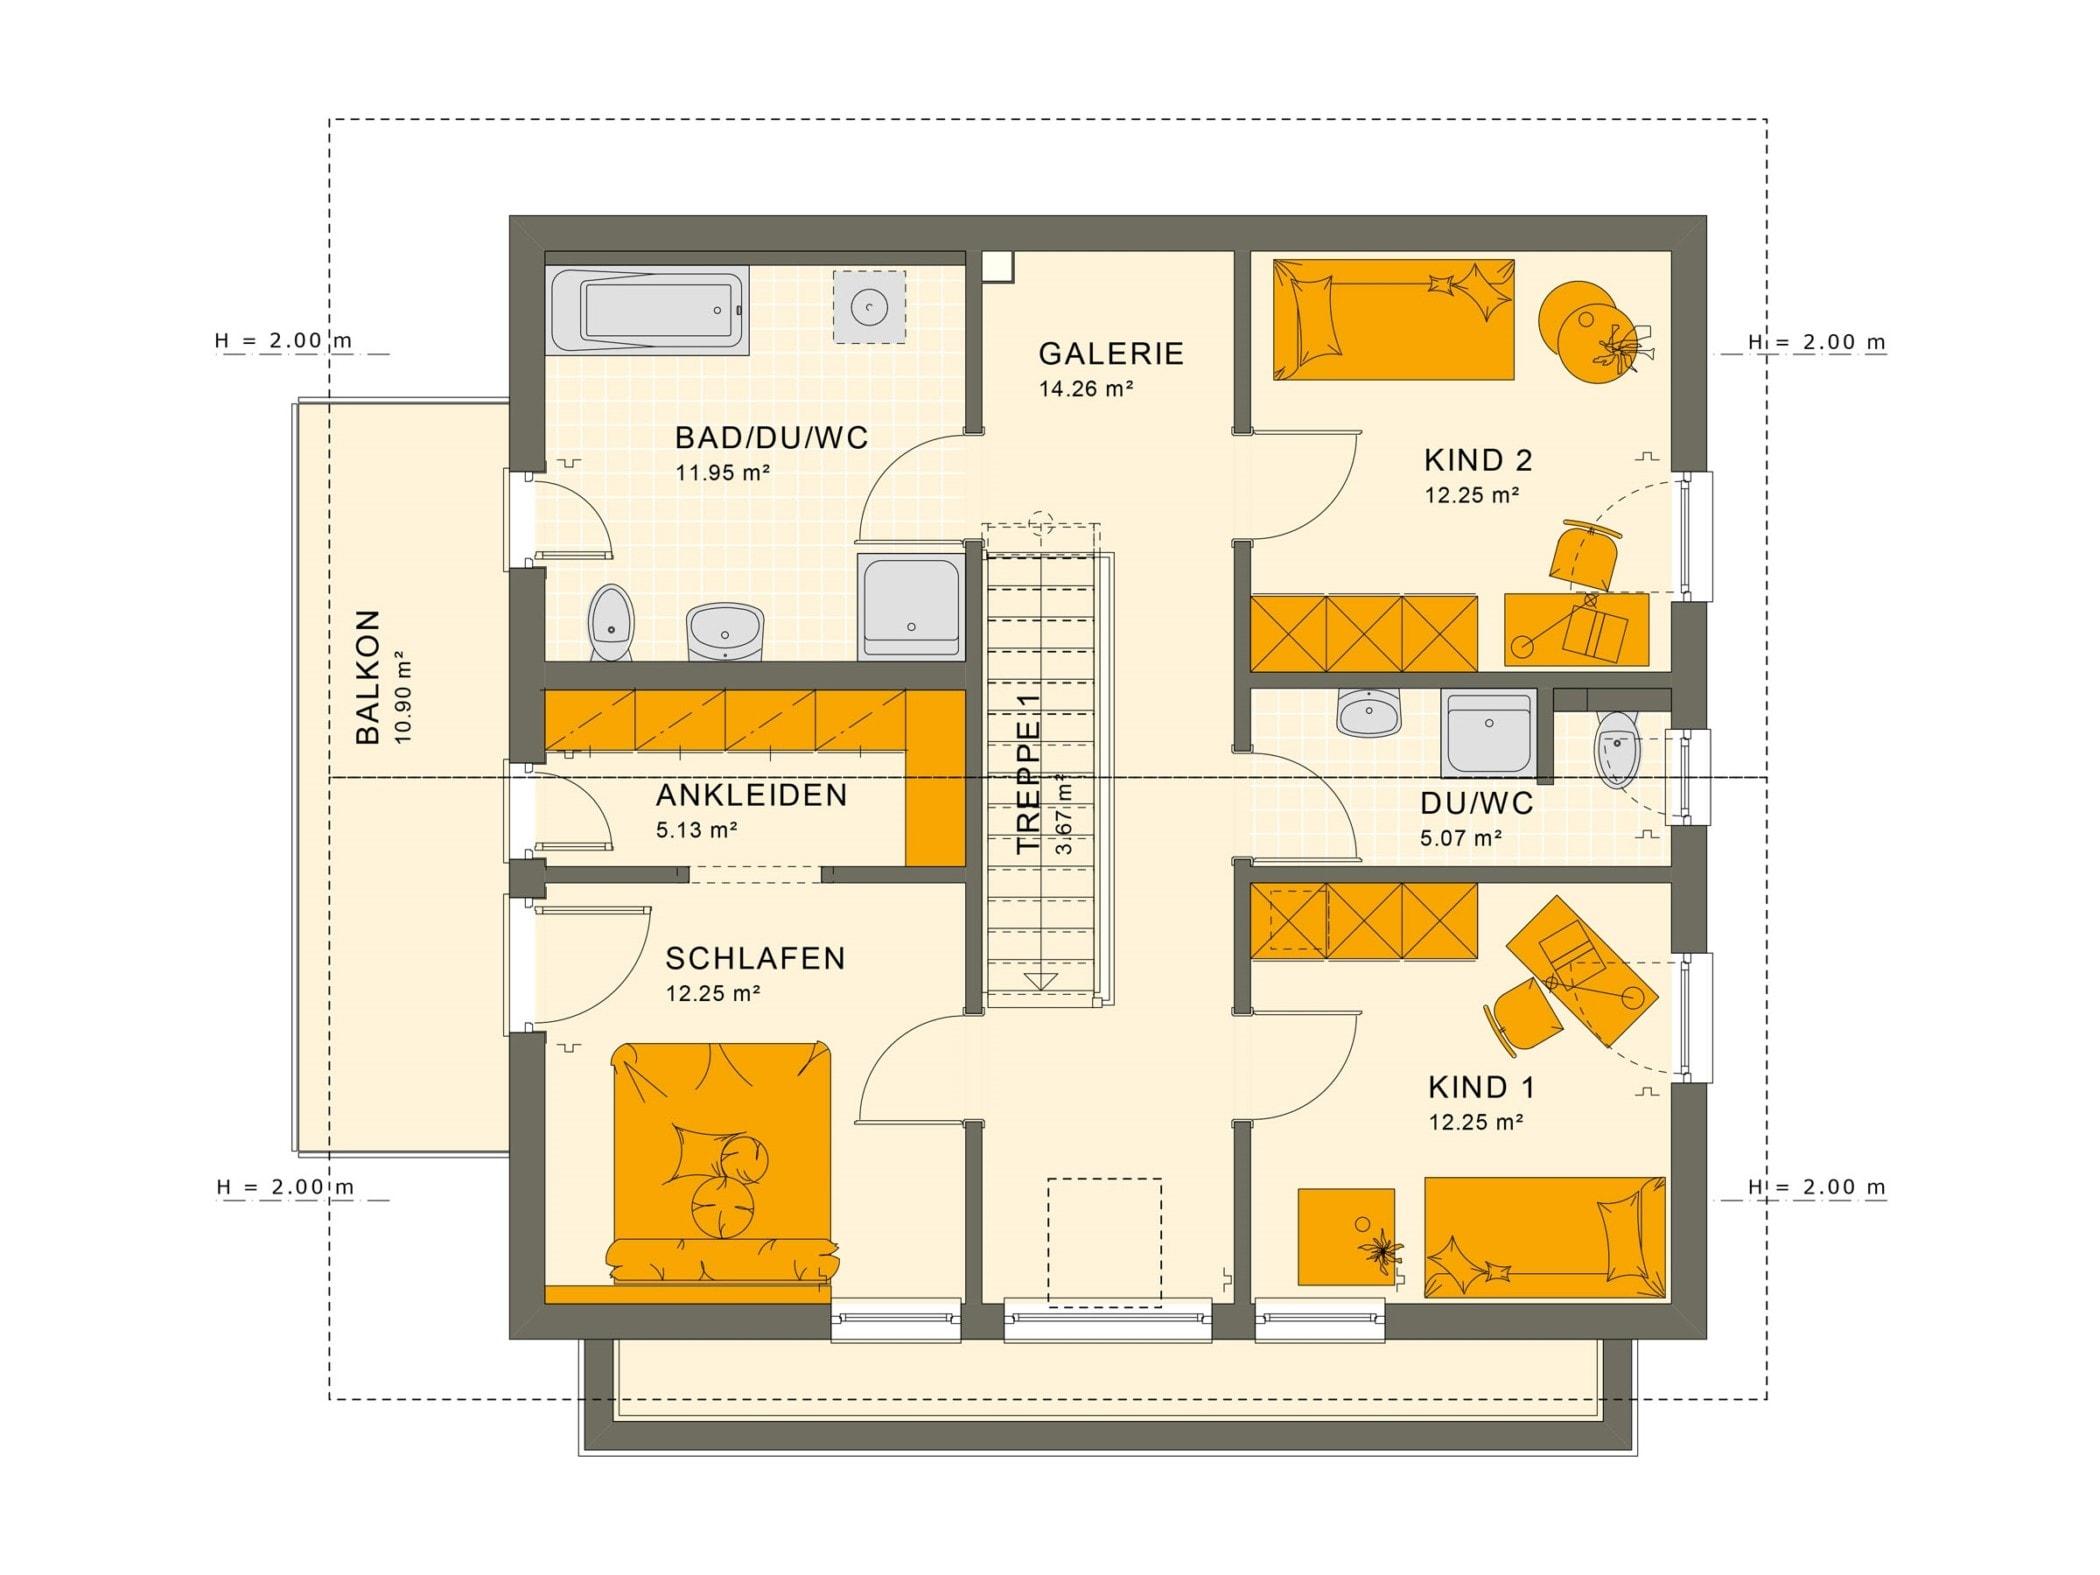 Einfamilienhaus Grundriss Obergeschoss mit Satteldach & gerade Treppe mit Galerie, 5 Zimmer, 150 qm - Fertighaus Living Haus SUNSHINE 154 V4 - HausbauDirekt.de